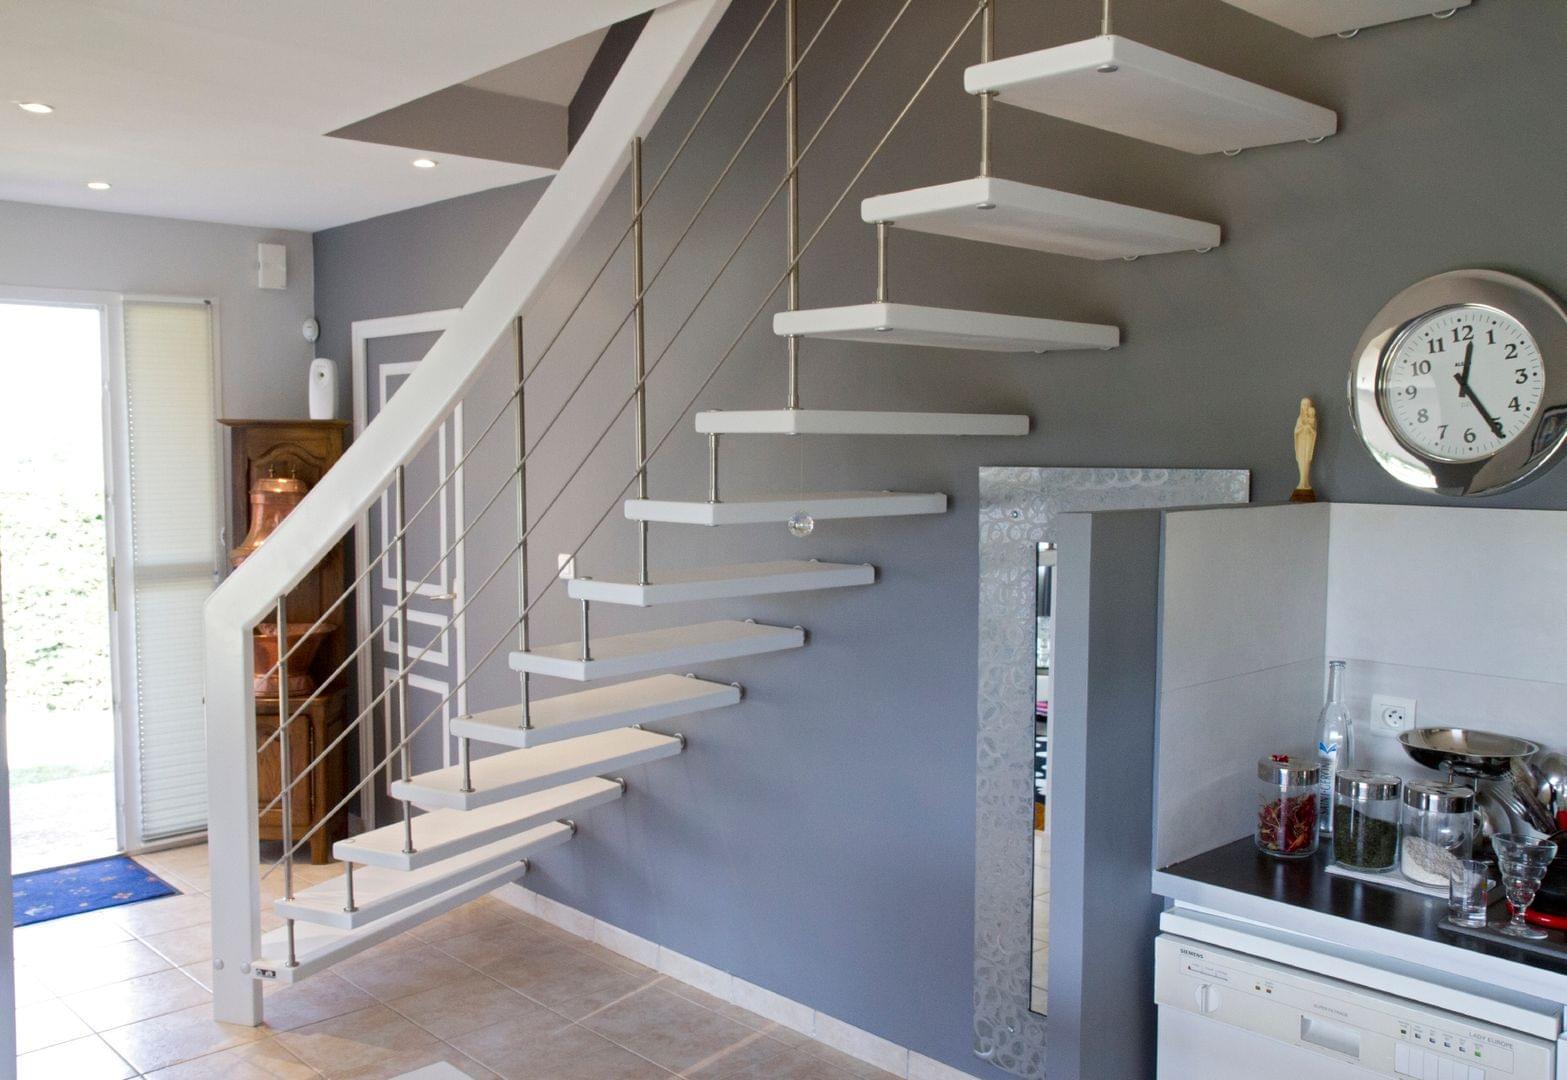 syst me de l 39 escalier suspendu invent par treppenmeister. Black Bedroom Furniture Sets. Home Design Ideas